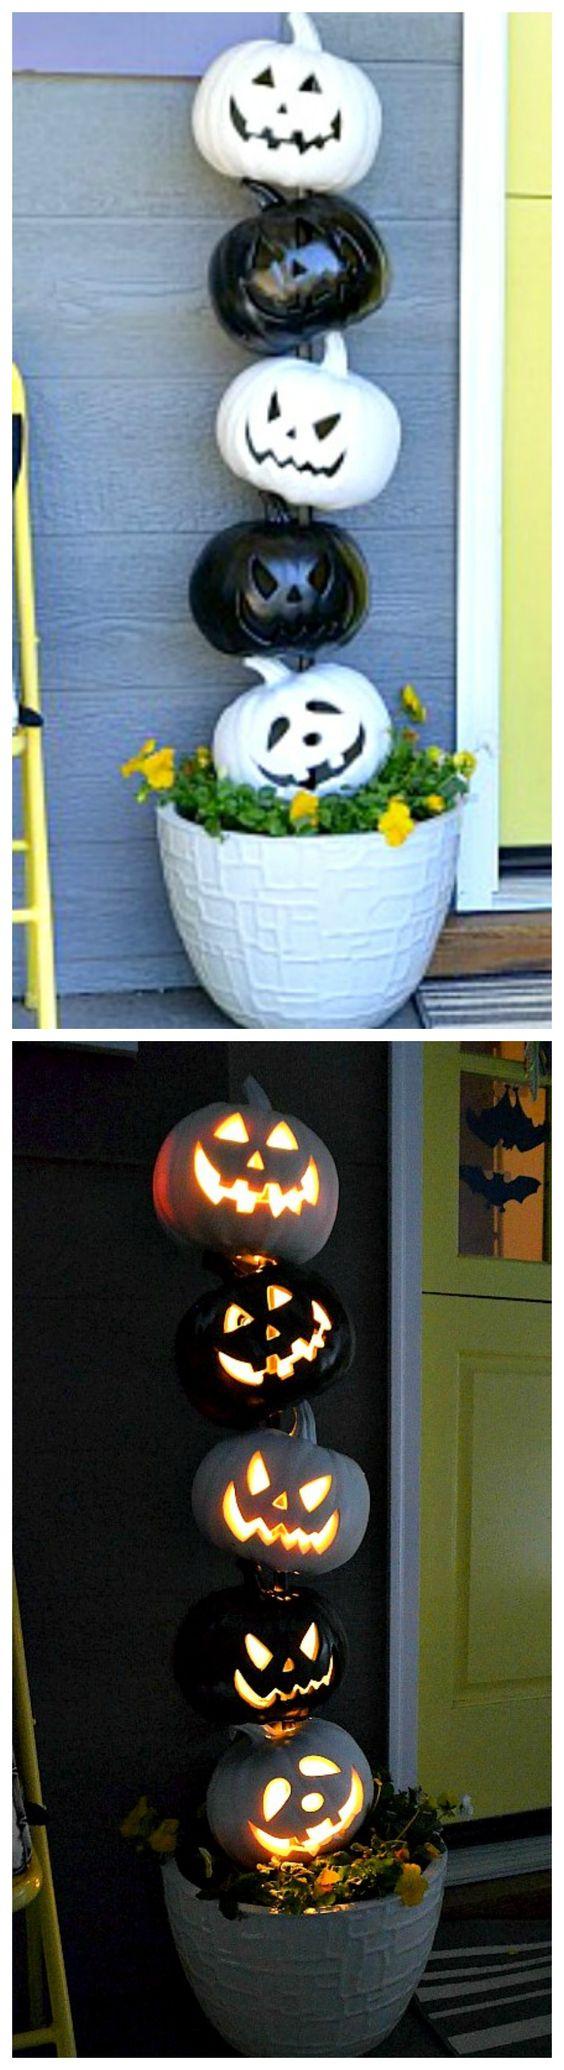 20. Black and White Pumpkins